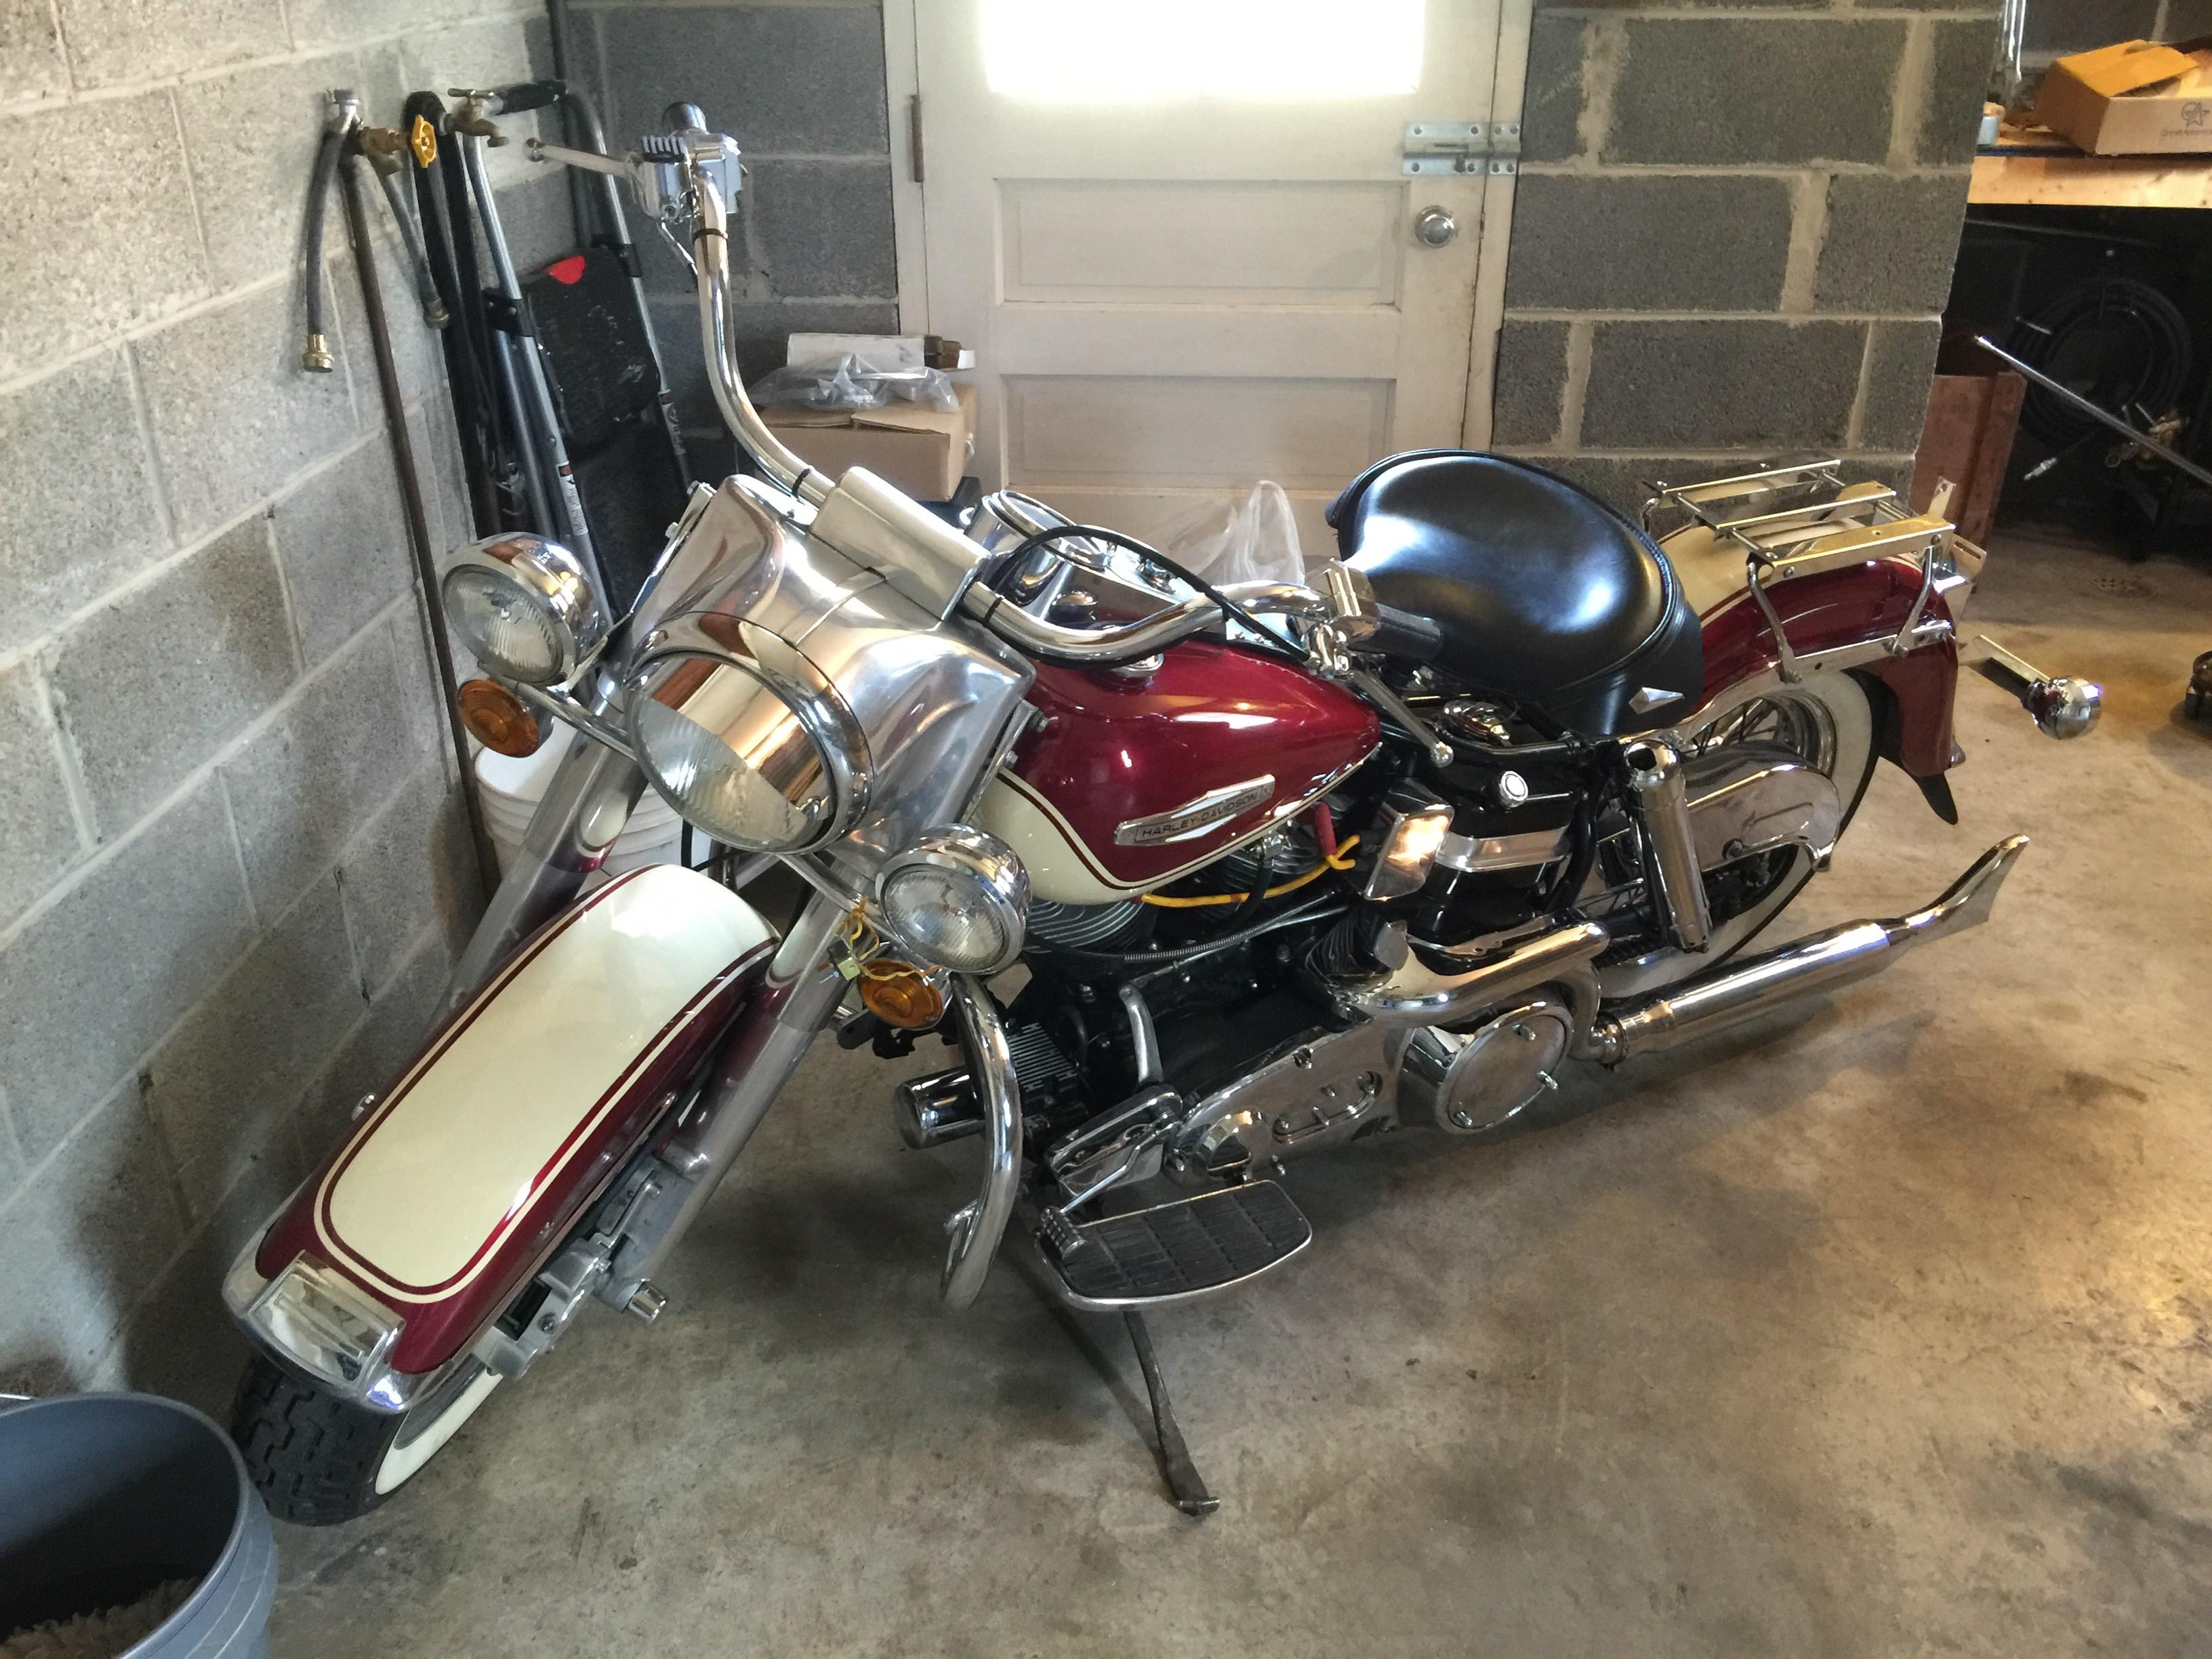 Harley Davidson Motorcycle Battery >> 1972 Harley-Davidson® FLH Electra Glide® w/ Sidecar (Burgundy And Cream), Greencastle ...